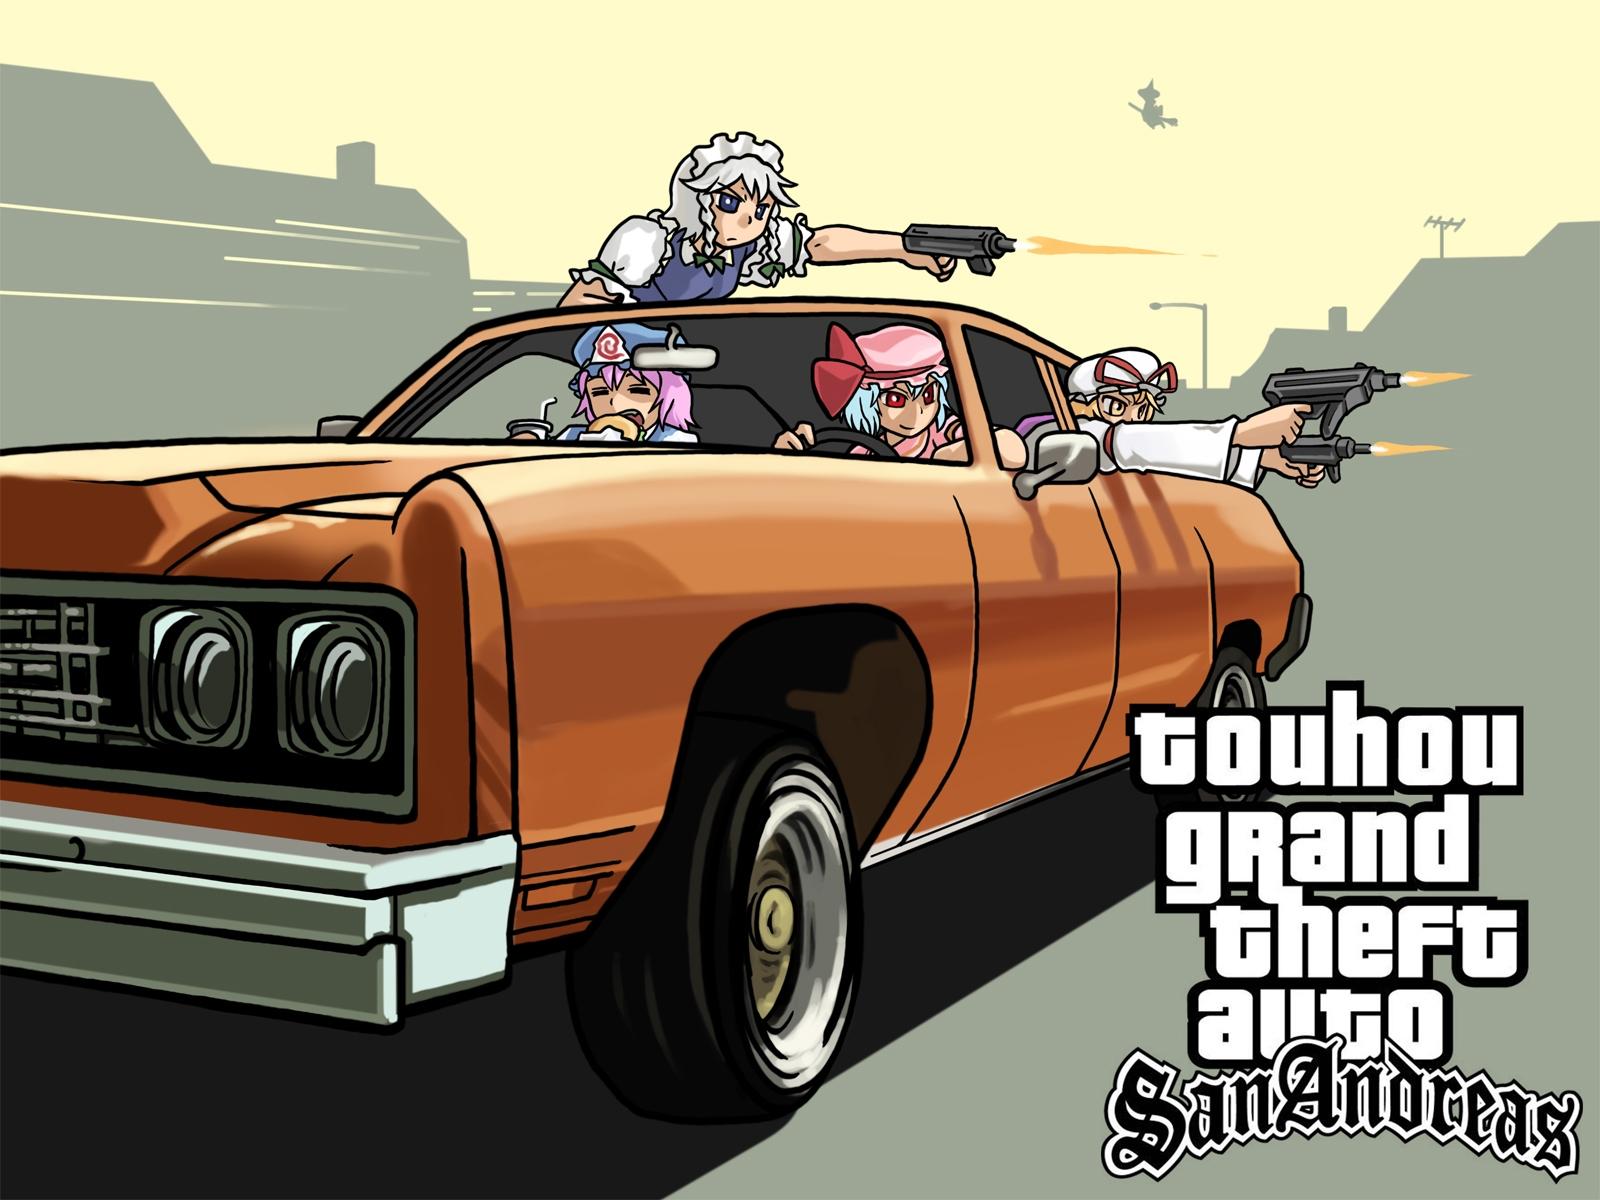 wallpaper : gta, grand theft auto, san andreas, car, anime 1600x1200